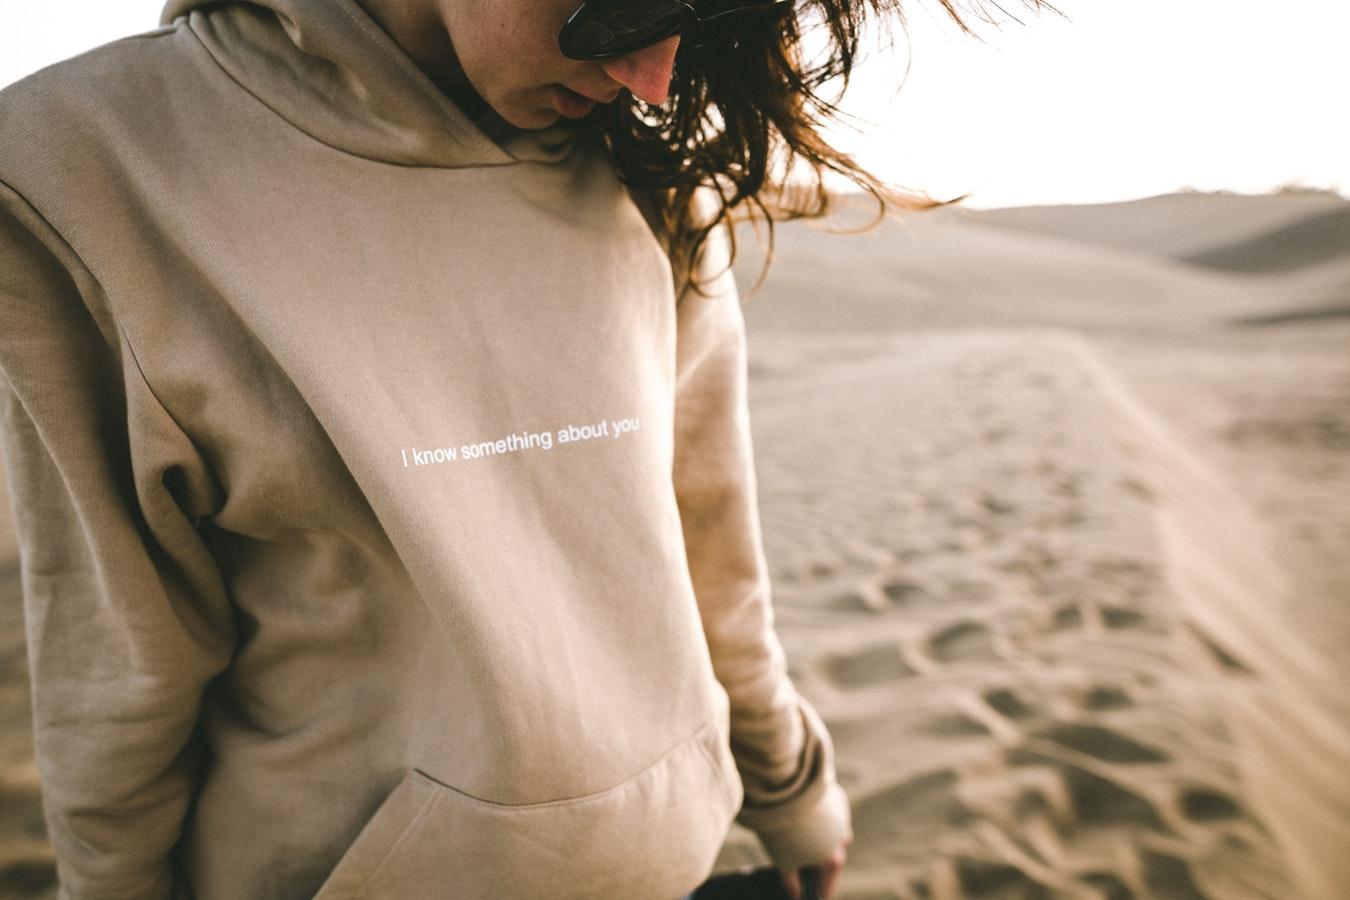 girl in gray sweatshirt